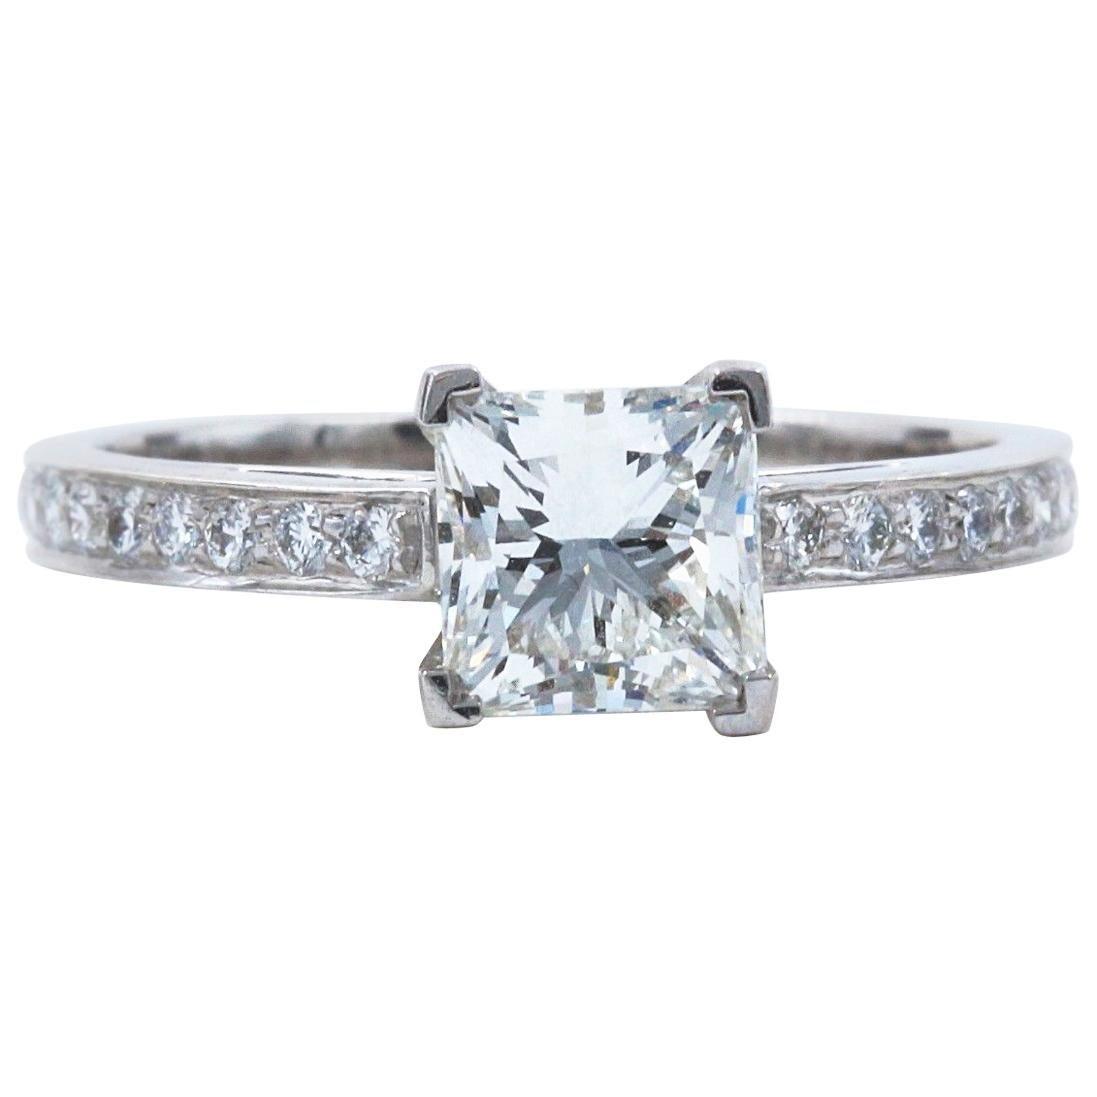 Tiffany & Co. Princess Diamond Engagement Ring 1.29 Carat Platinum